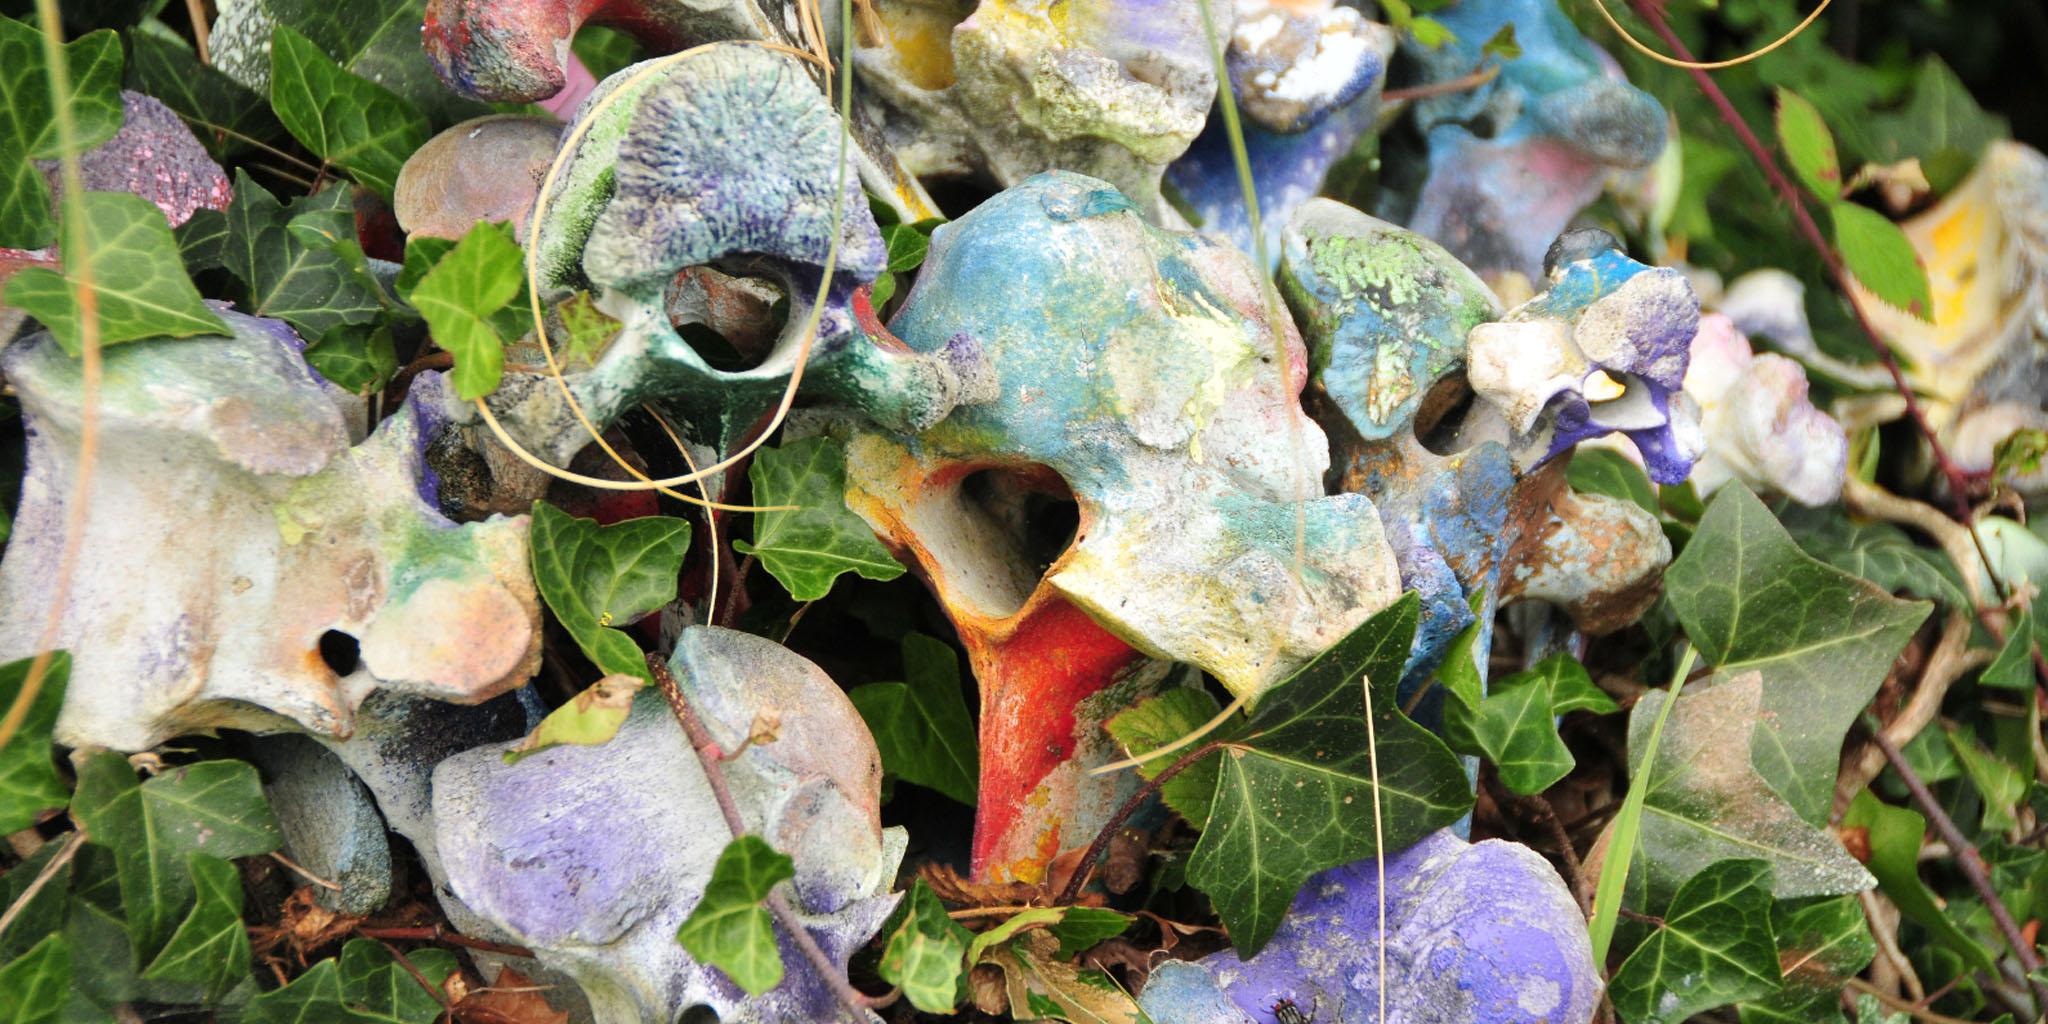 Gallery as Garden | Joan Davis at Mermaid Arts Centre, Bray